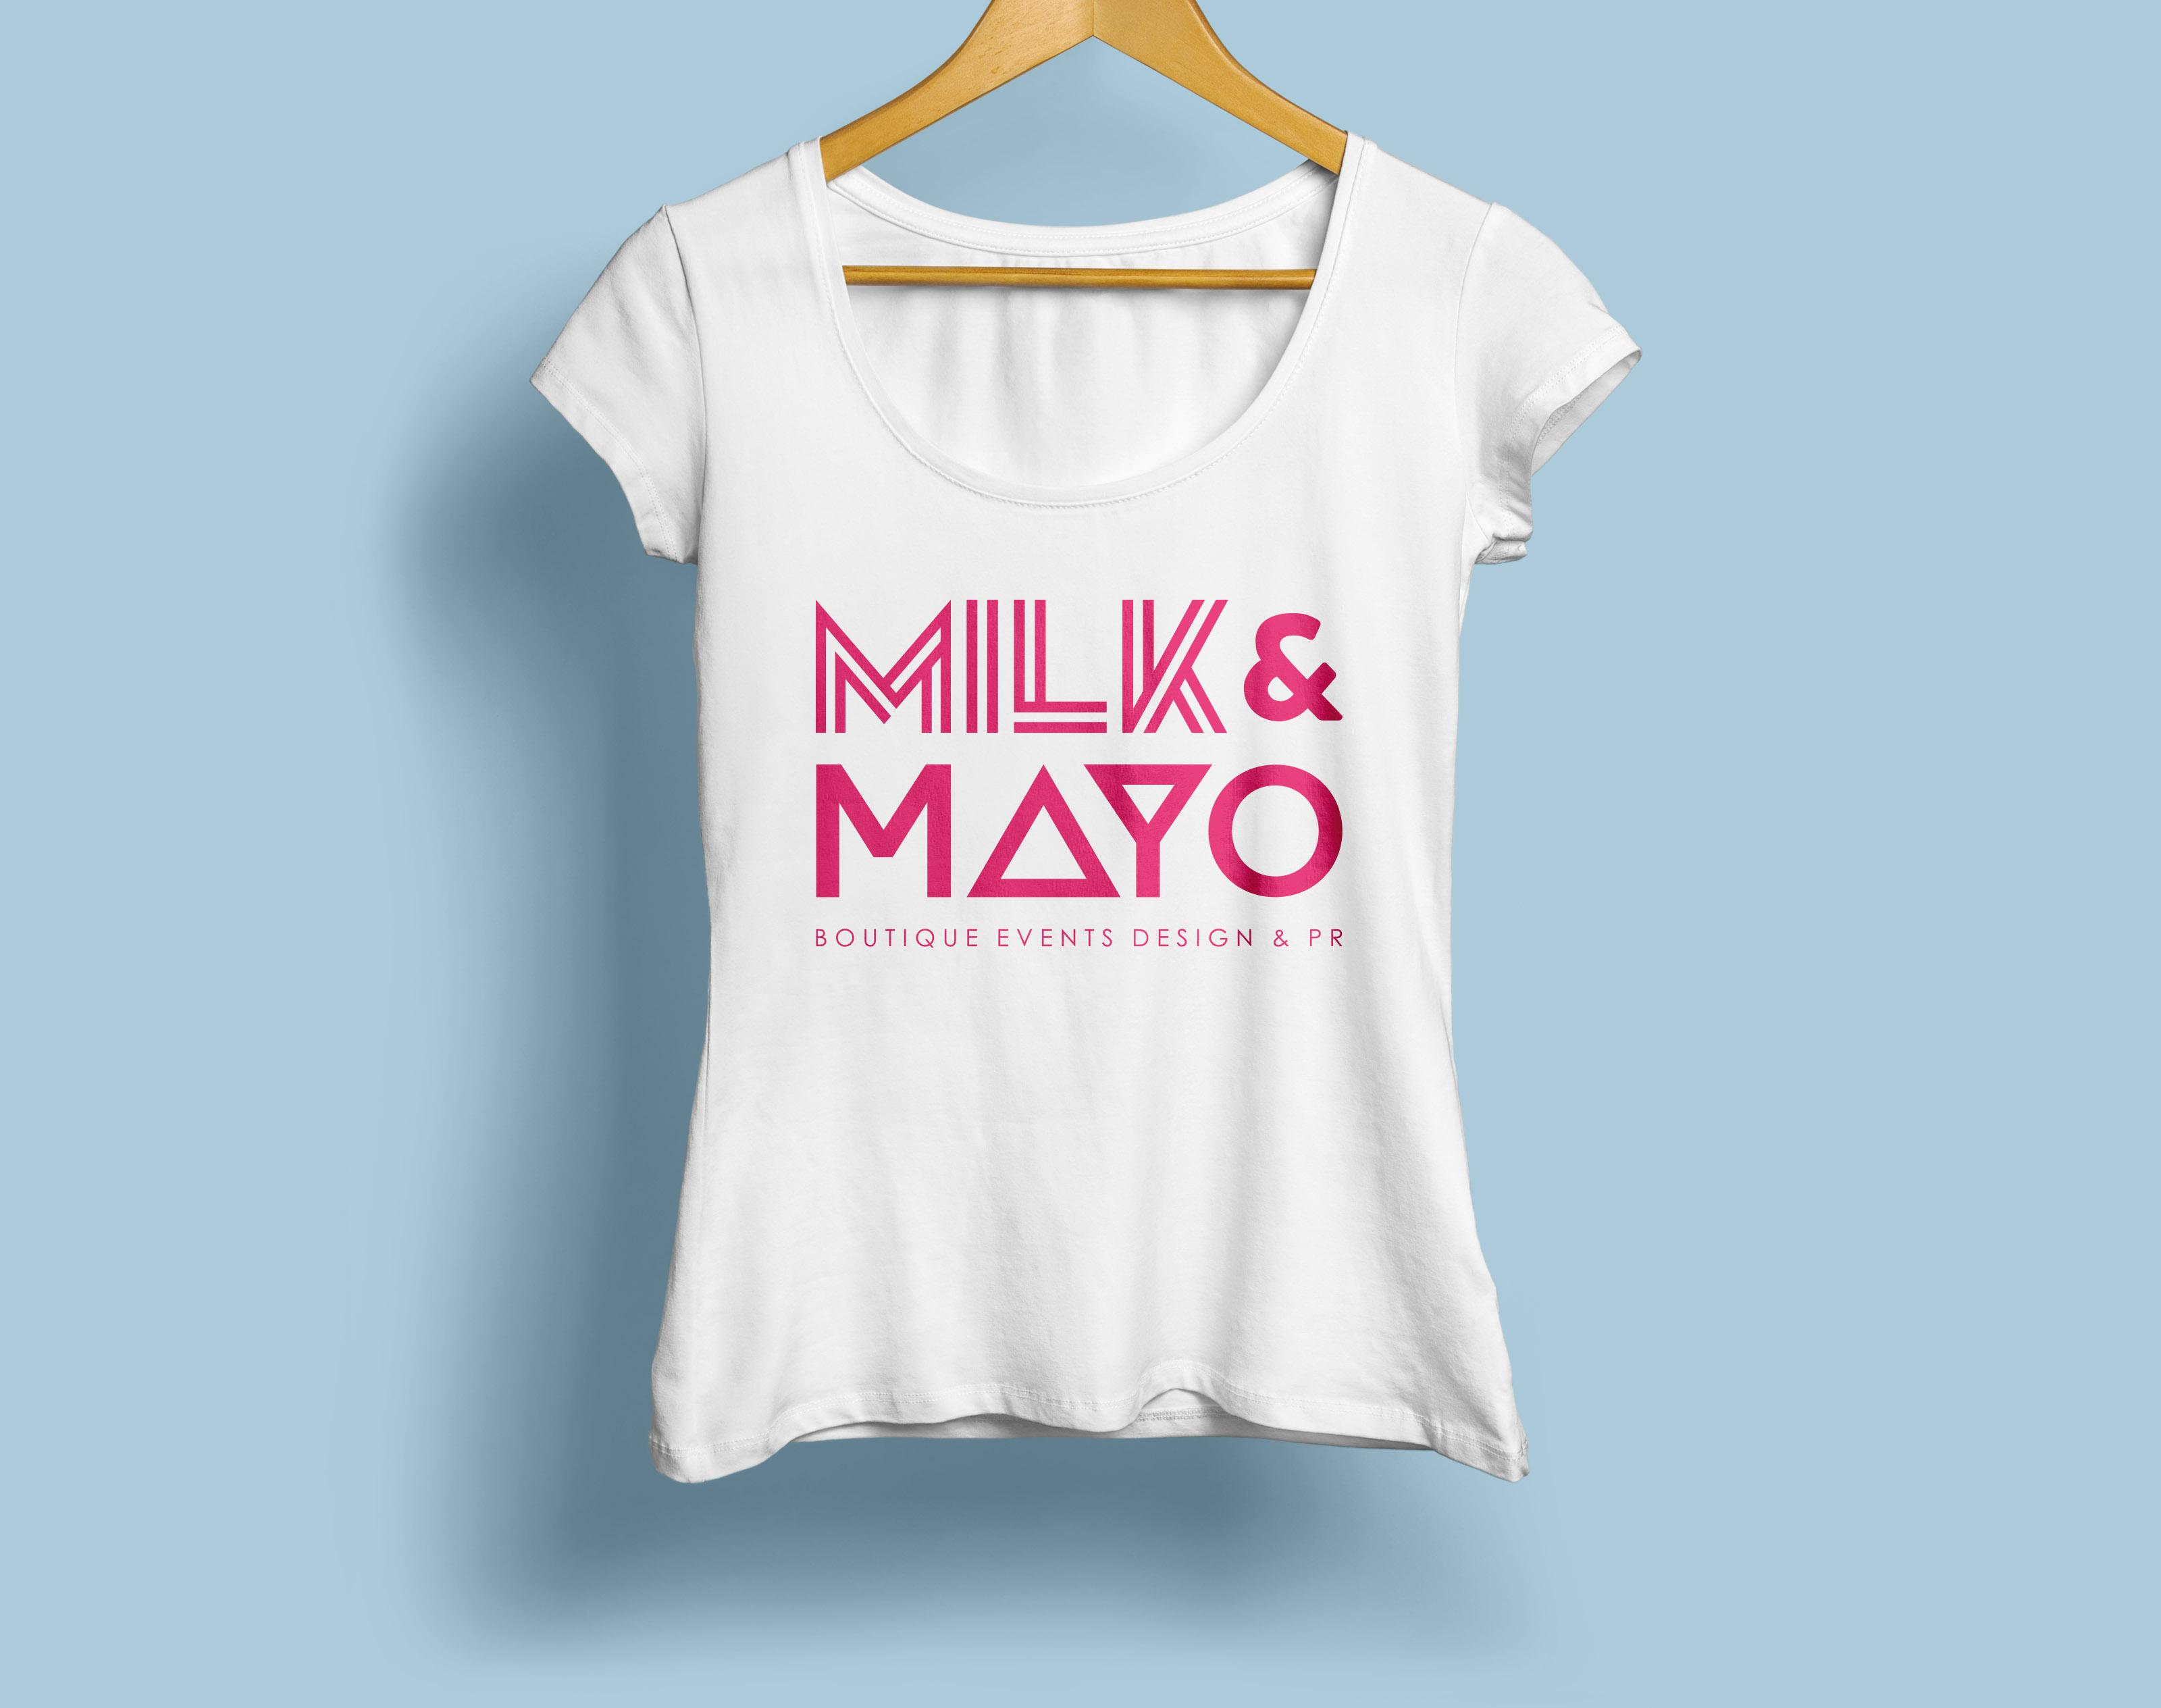 Milk & Mayo